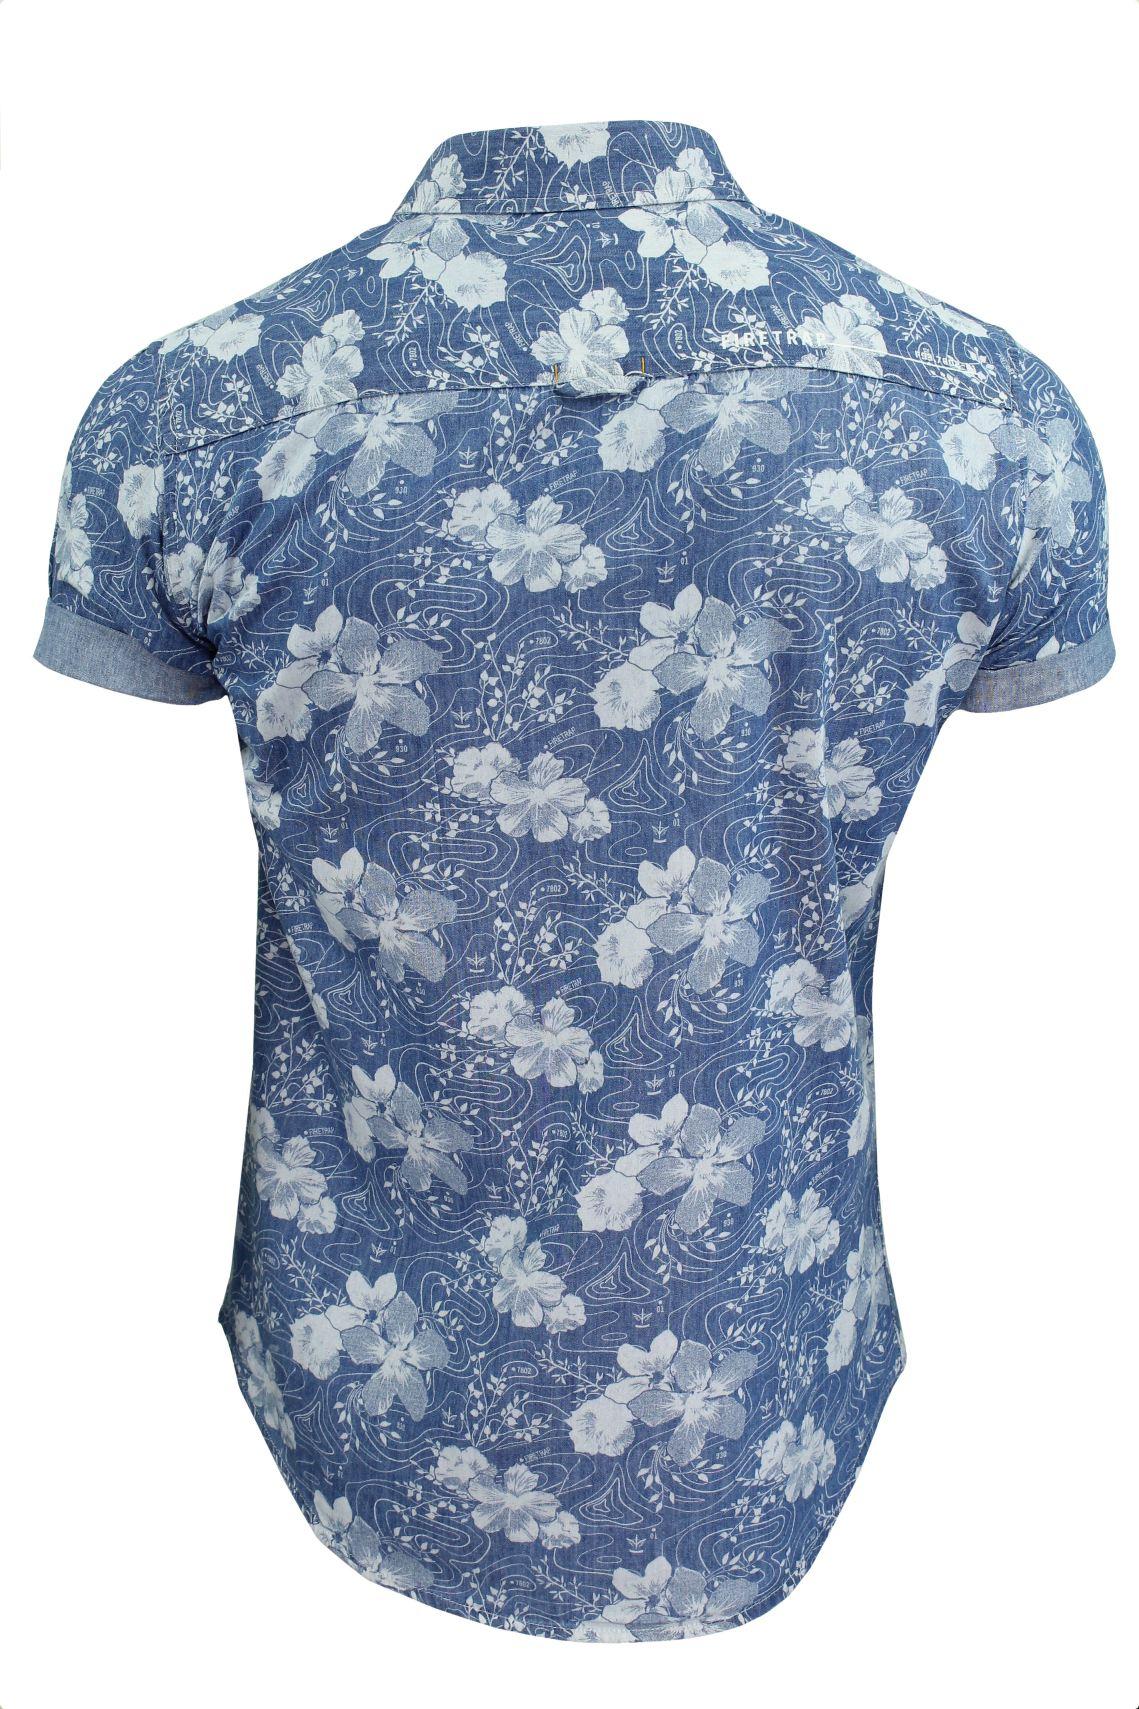 Mens-Short-Sleeved-Shirt-by-Firetrap thumbnail 20